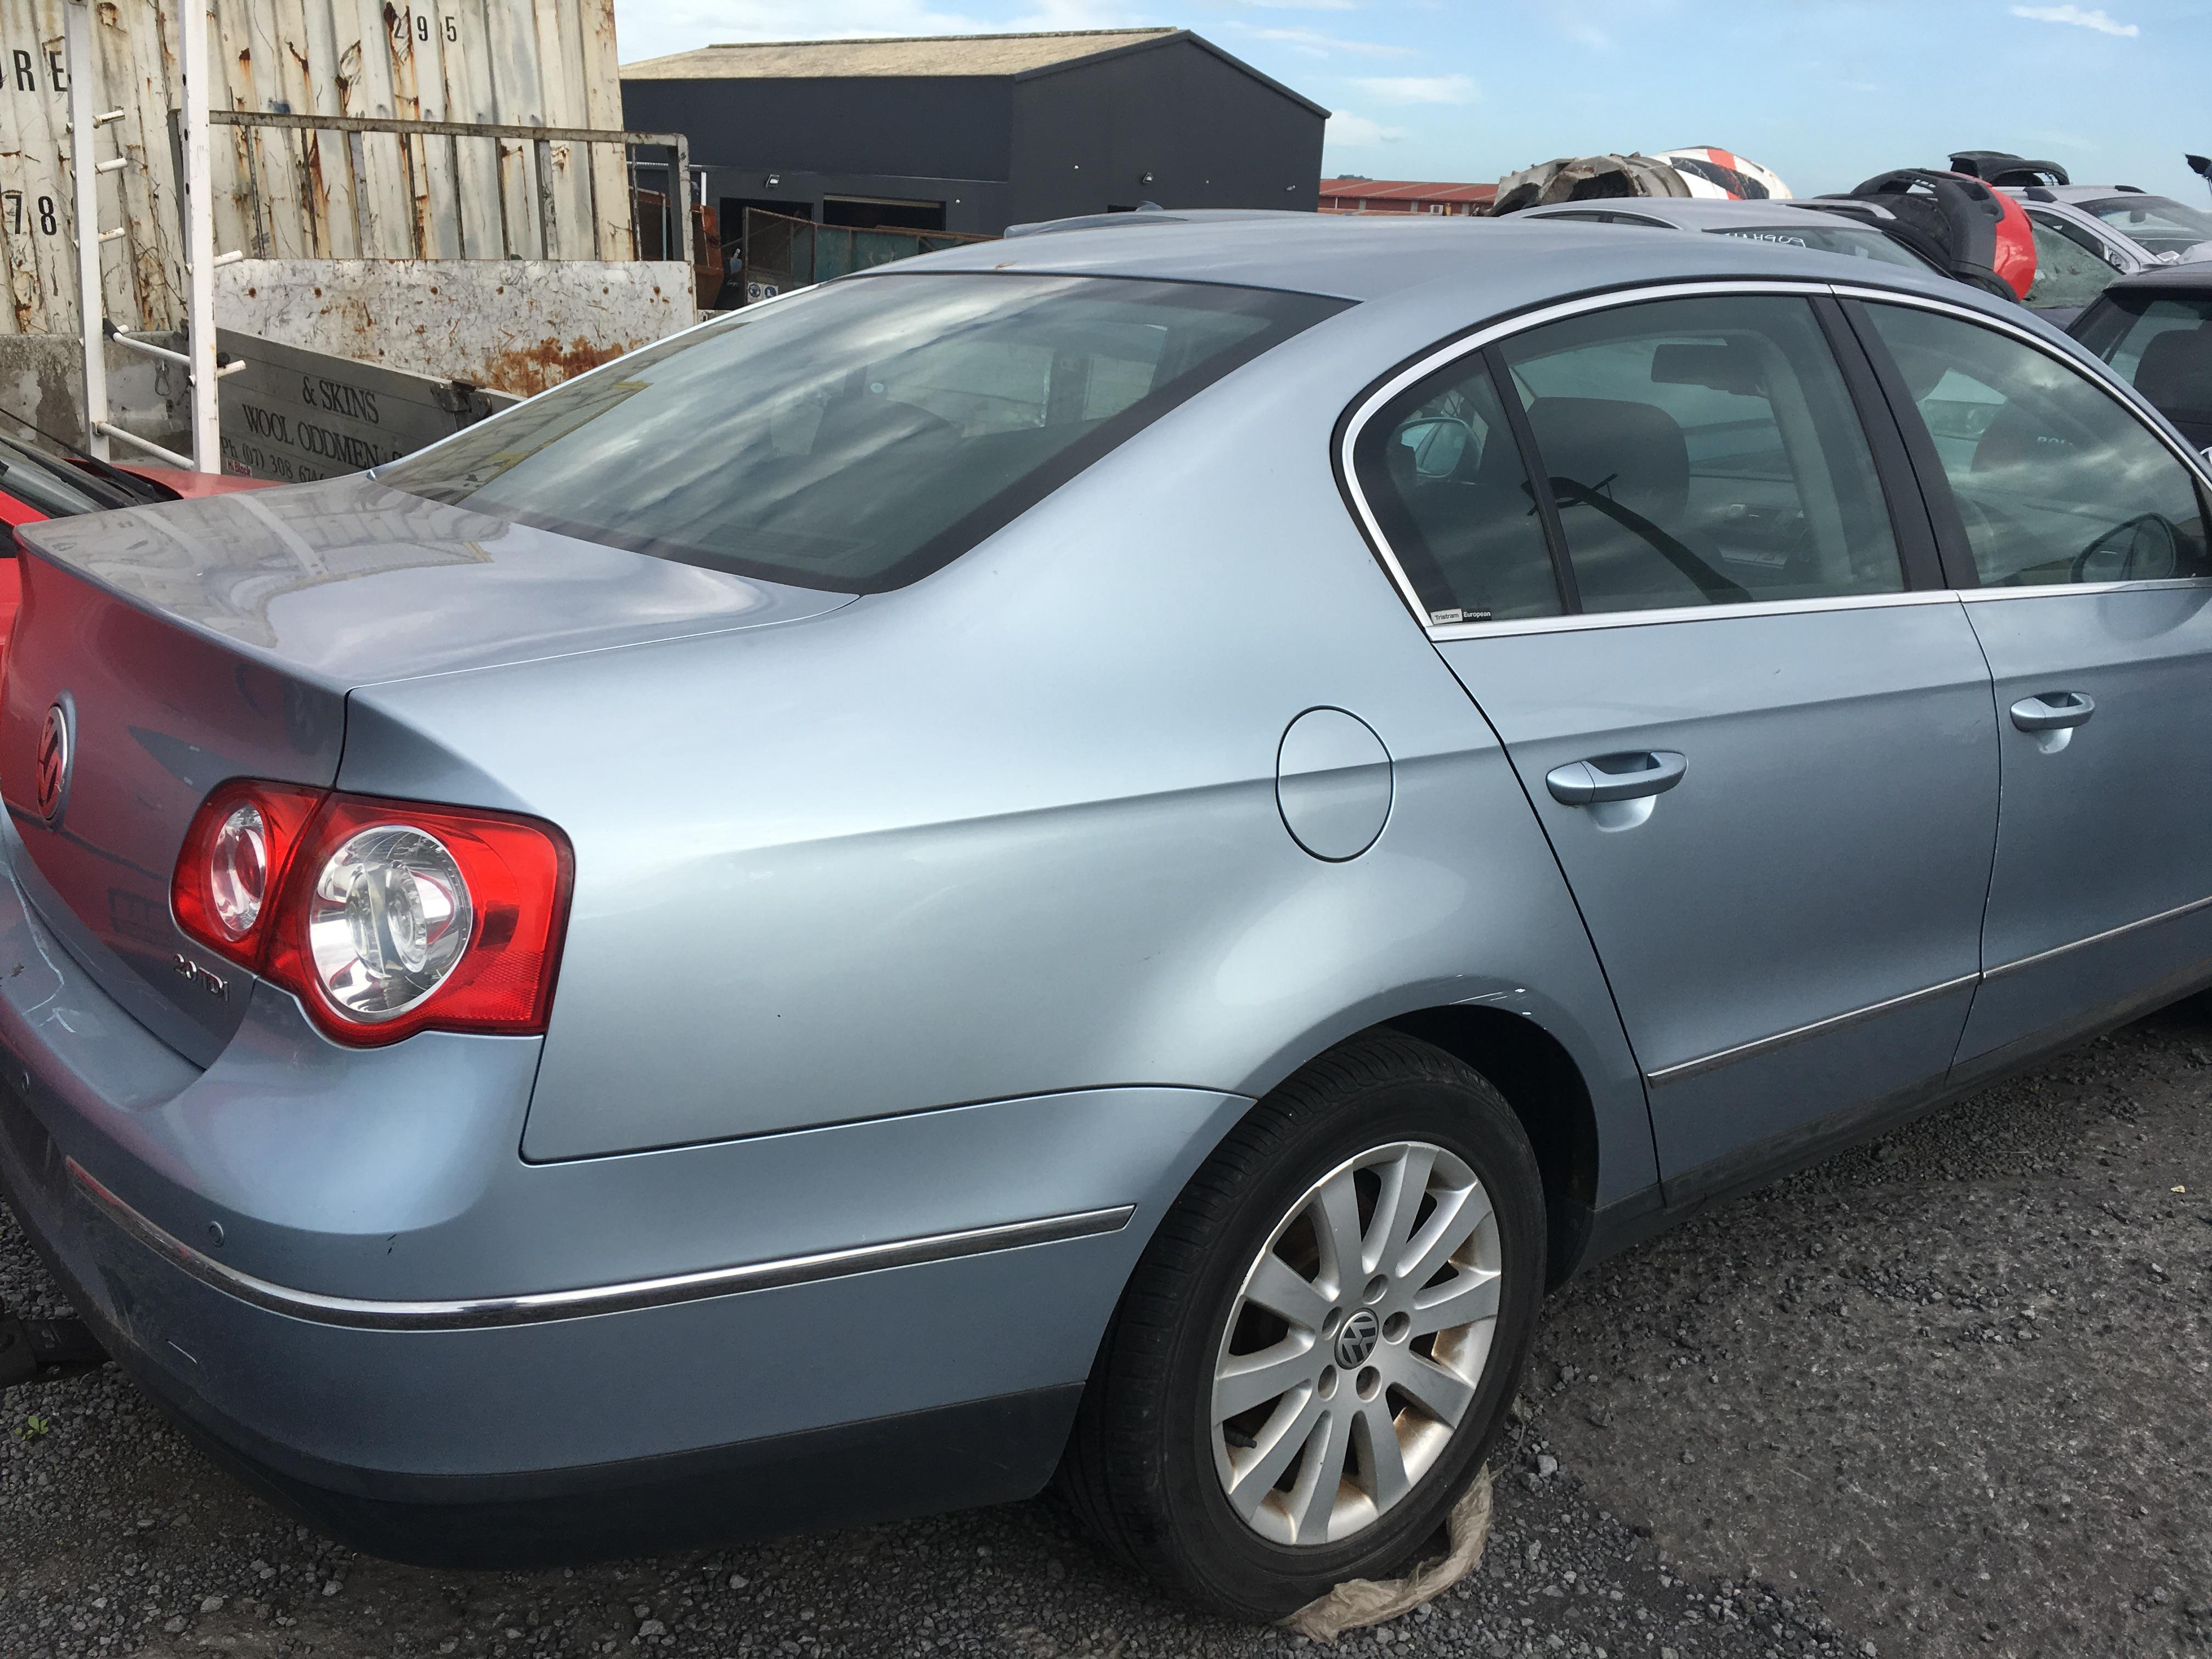 VW Passat 2005